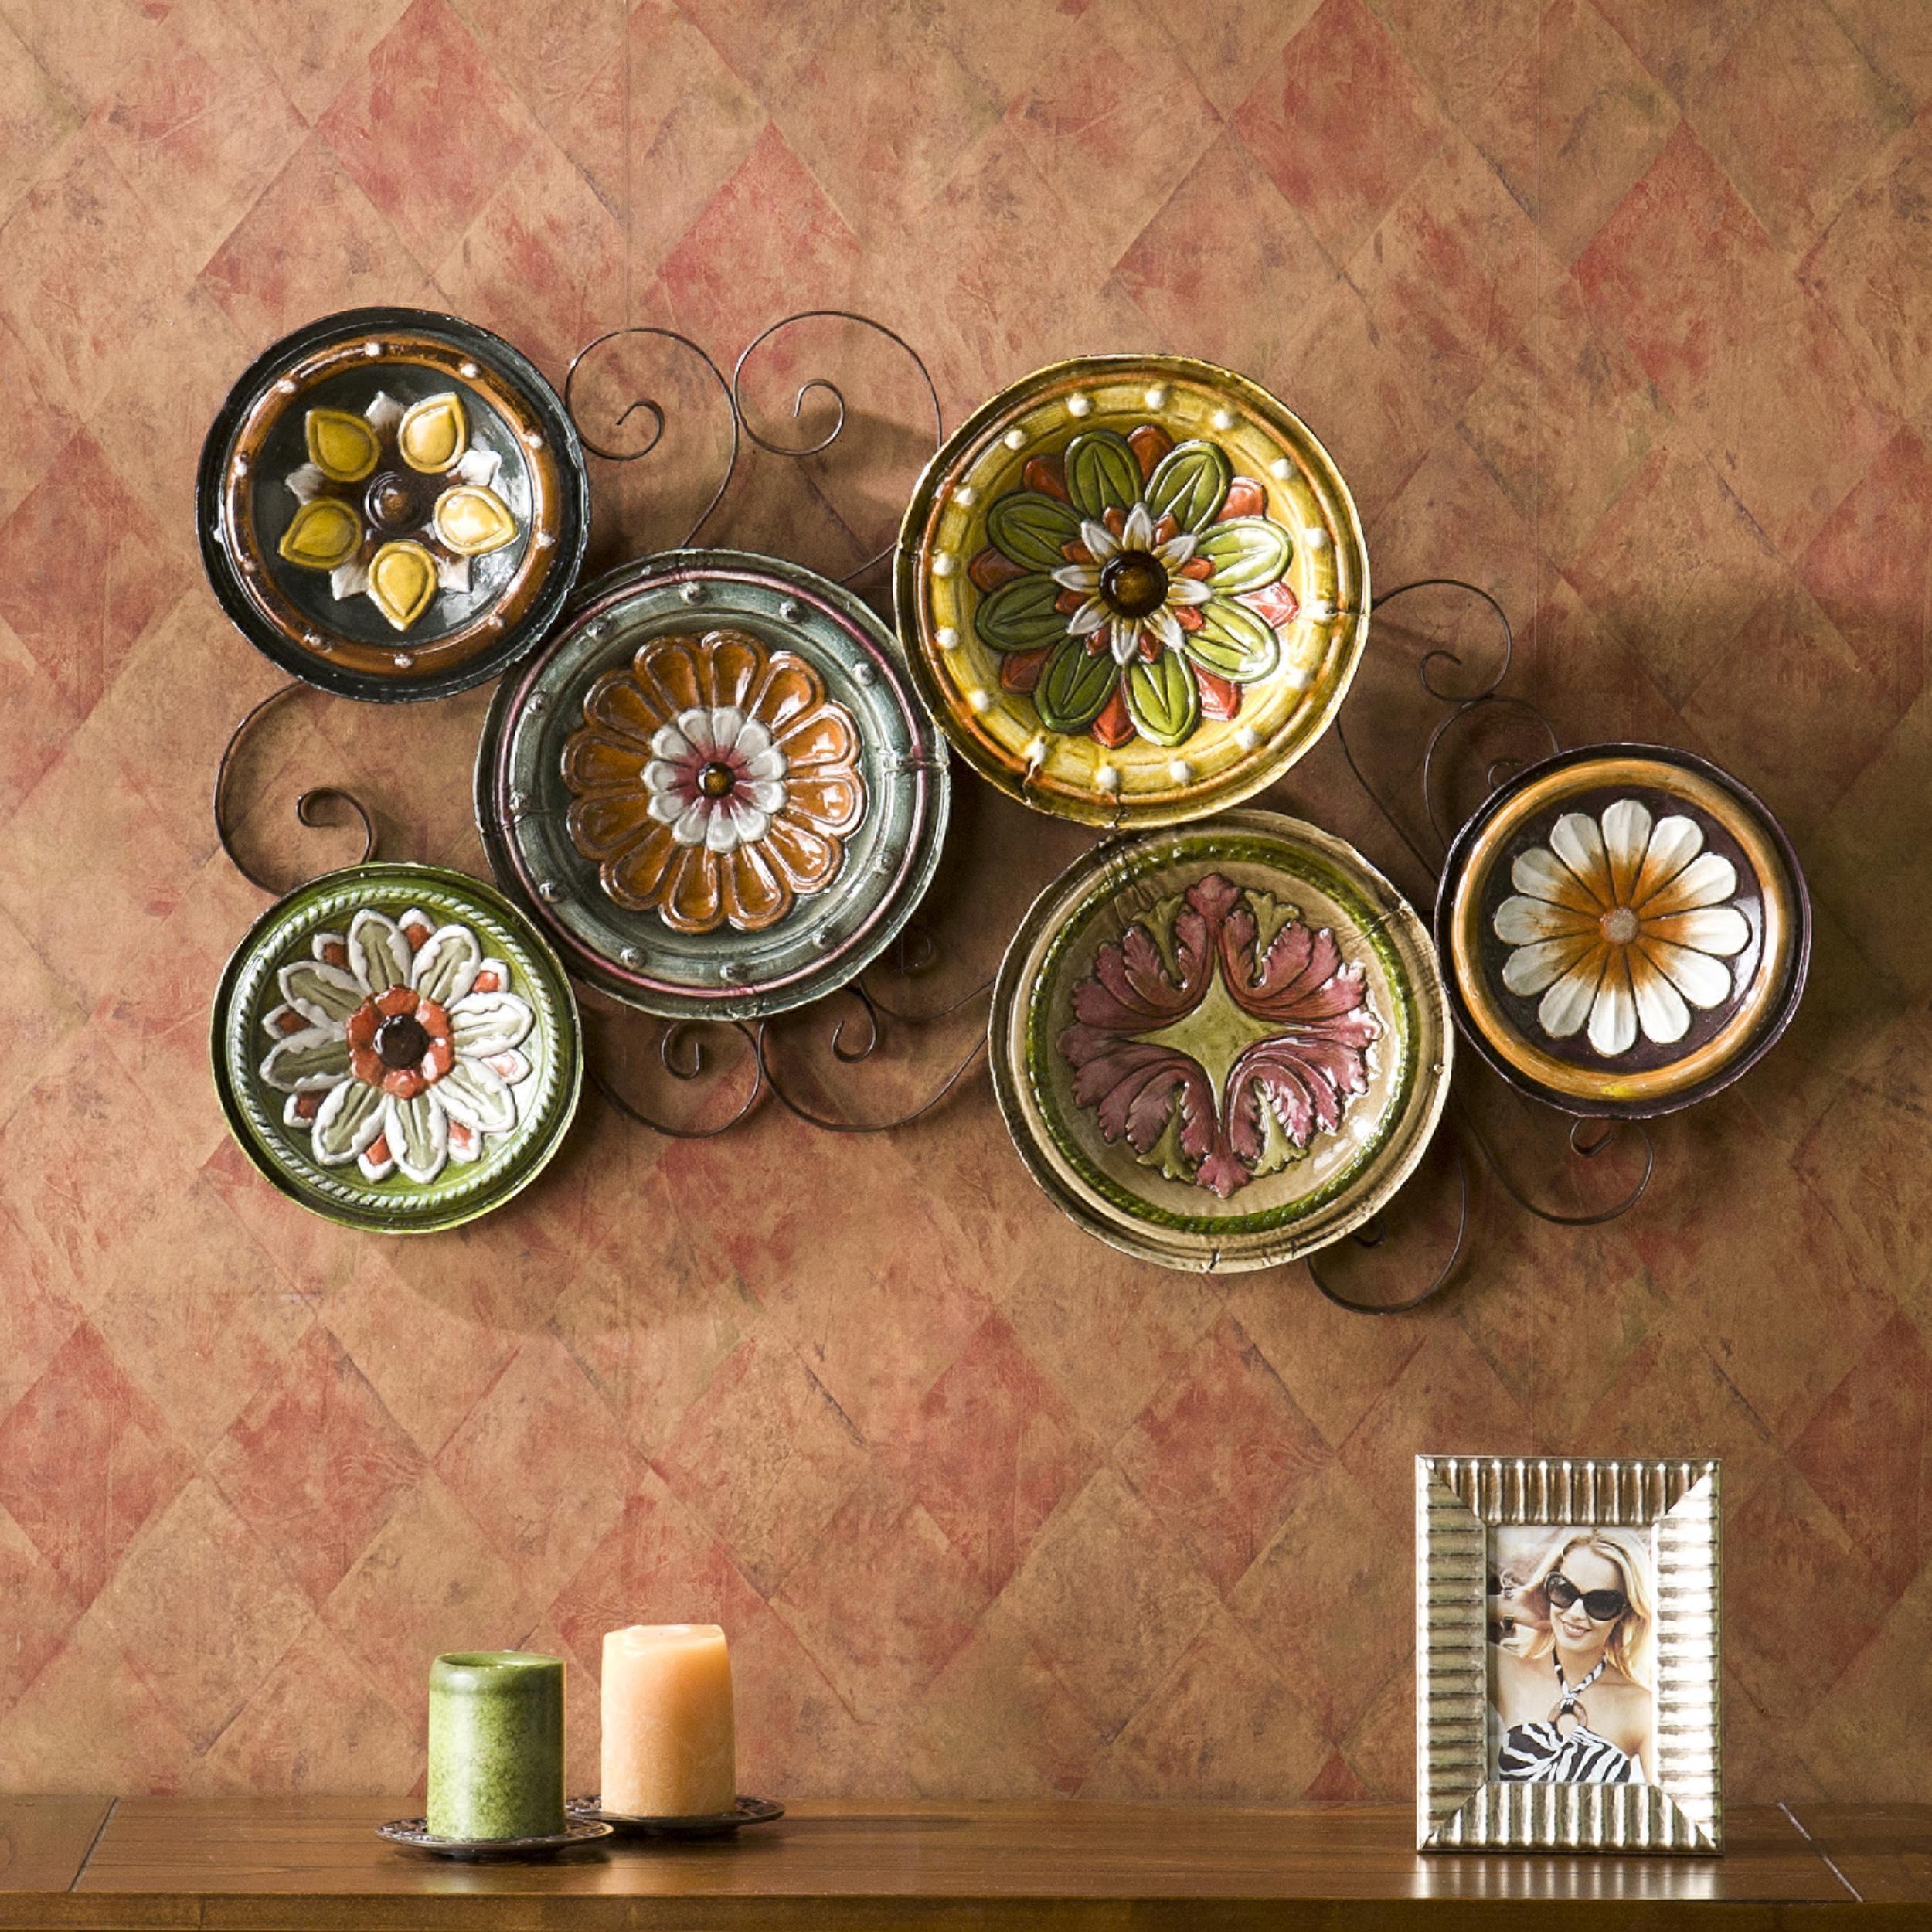 Wall Art Decor: Unique Decoration Plates Wall Art Full Frame Good Regarding Italian Glass Wall Art (Image 19 of 20)